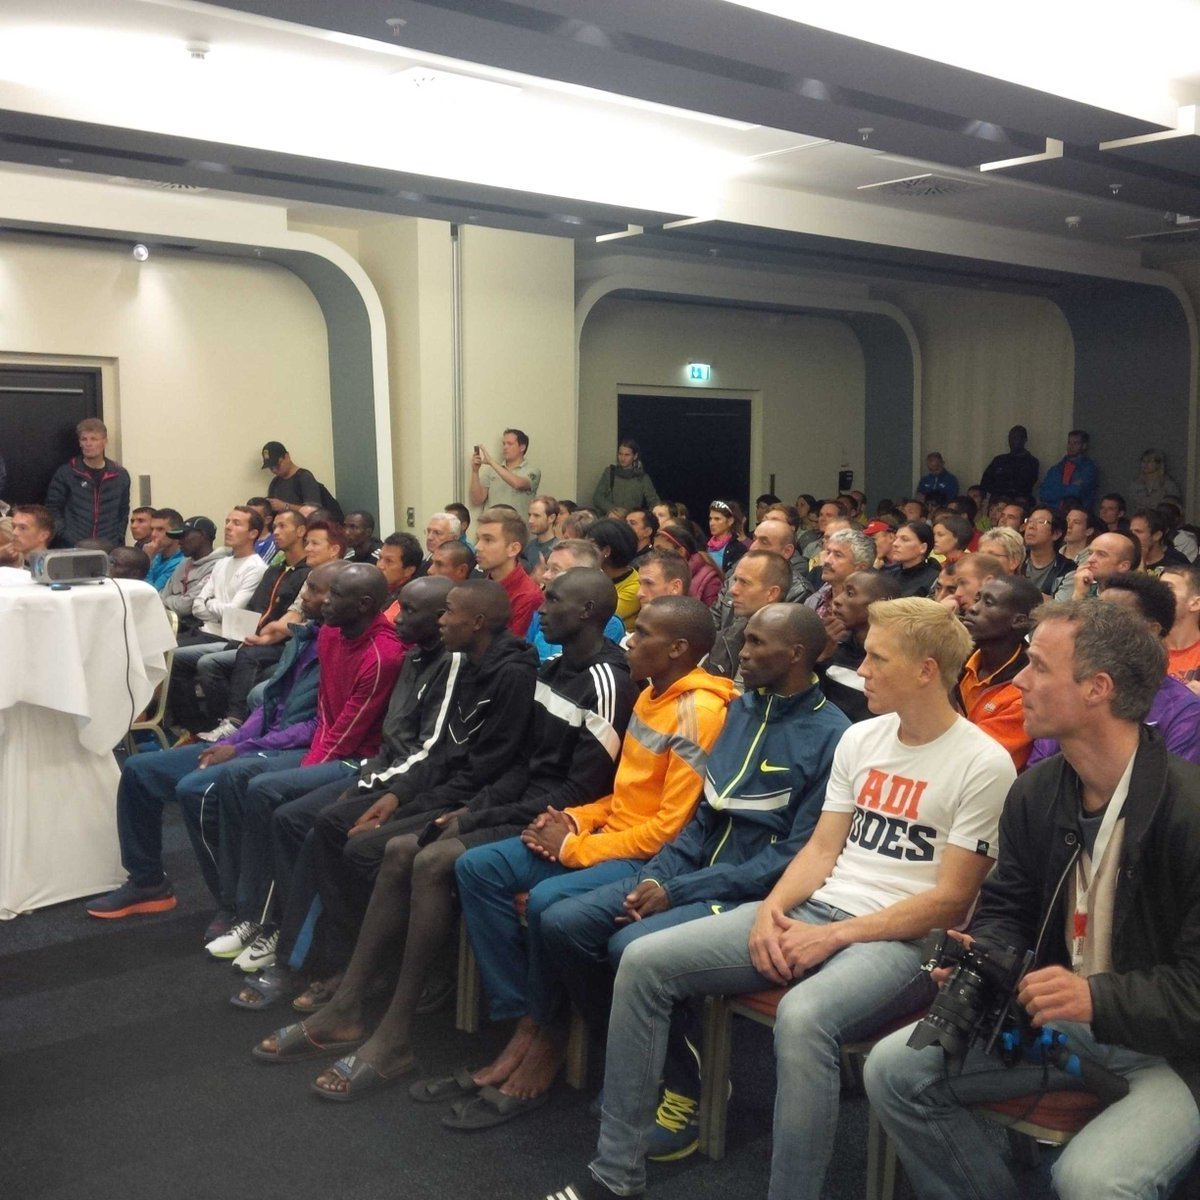 Elite athletes attending the technical meeting for #HaspaMarathon #RunHamburg @HaspaMarathonHH<br>http://pic.twitter.com/cI4vPyj8i9